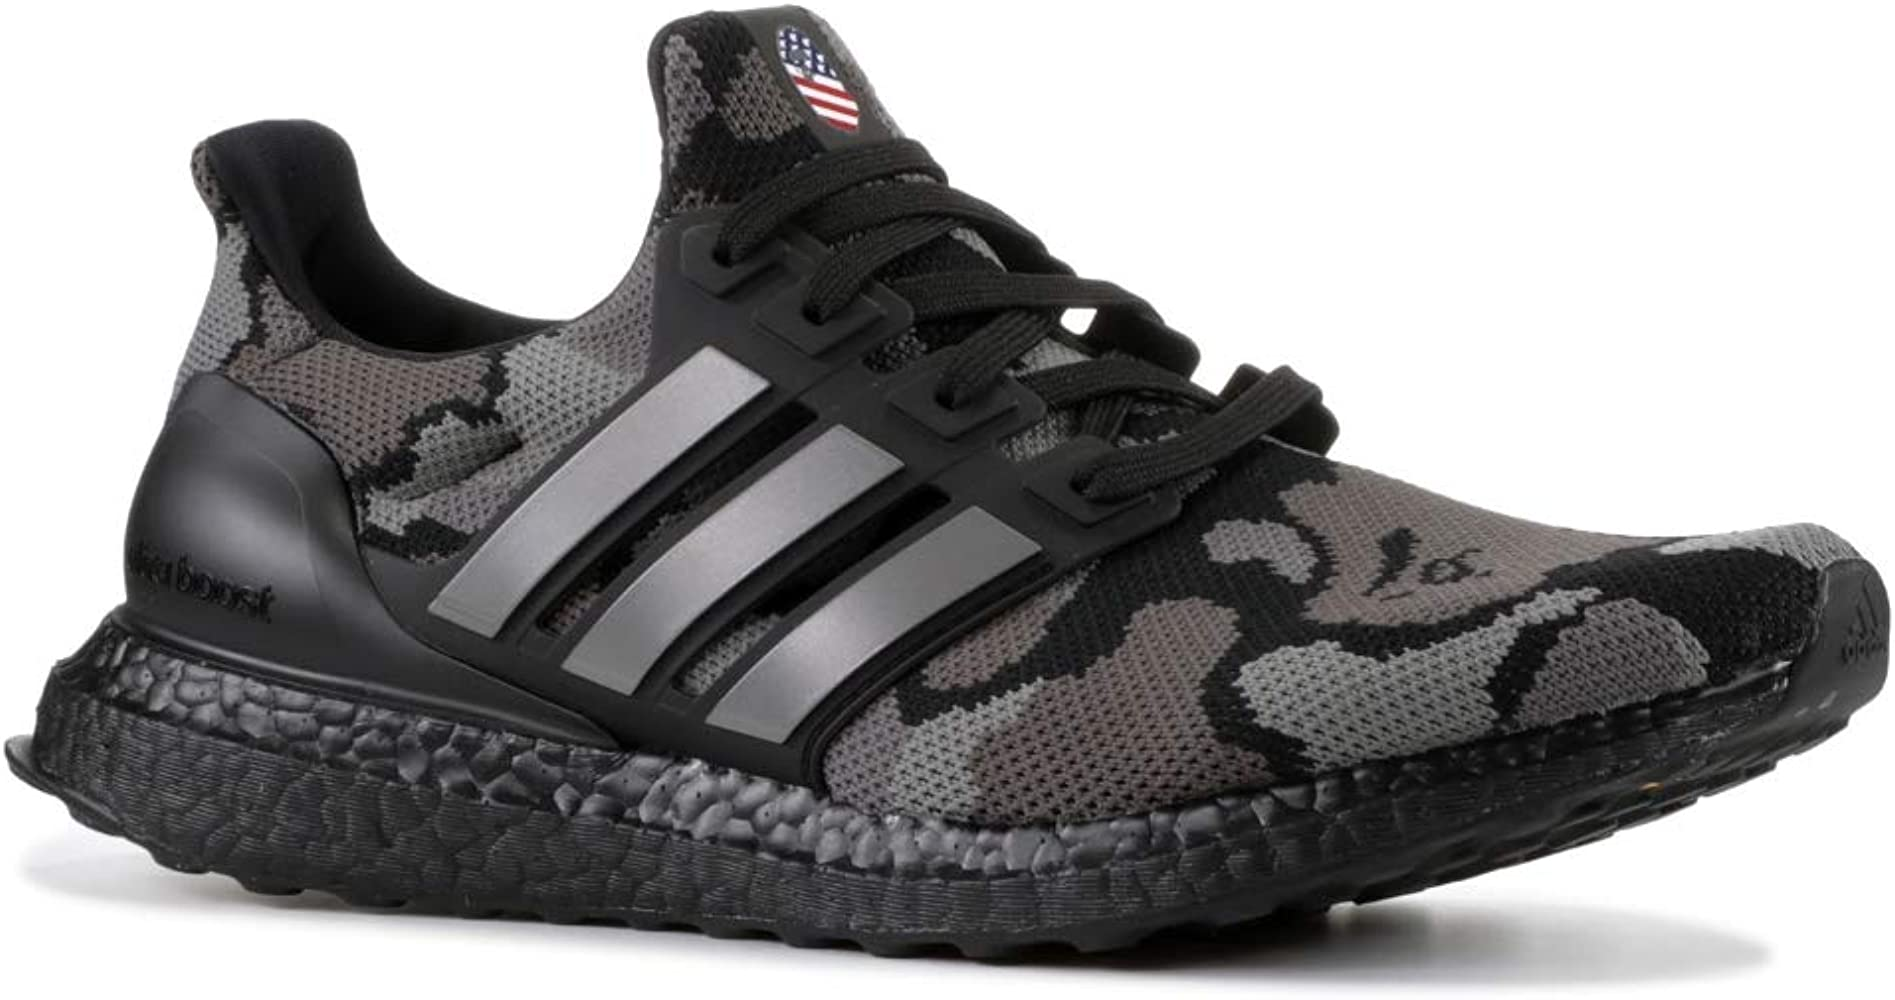 adidas Bape X Ultraboost 'Black Camo